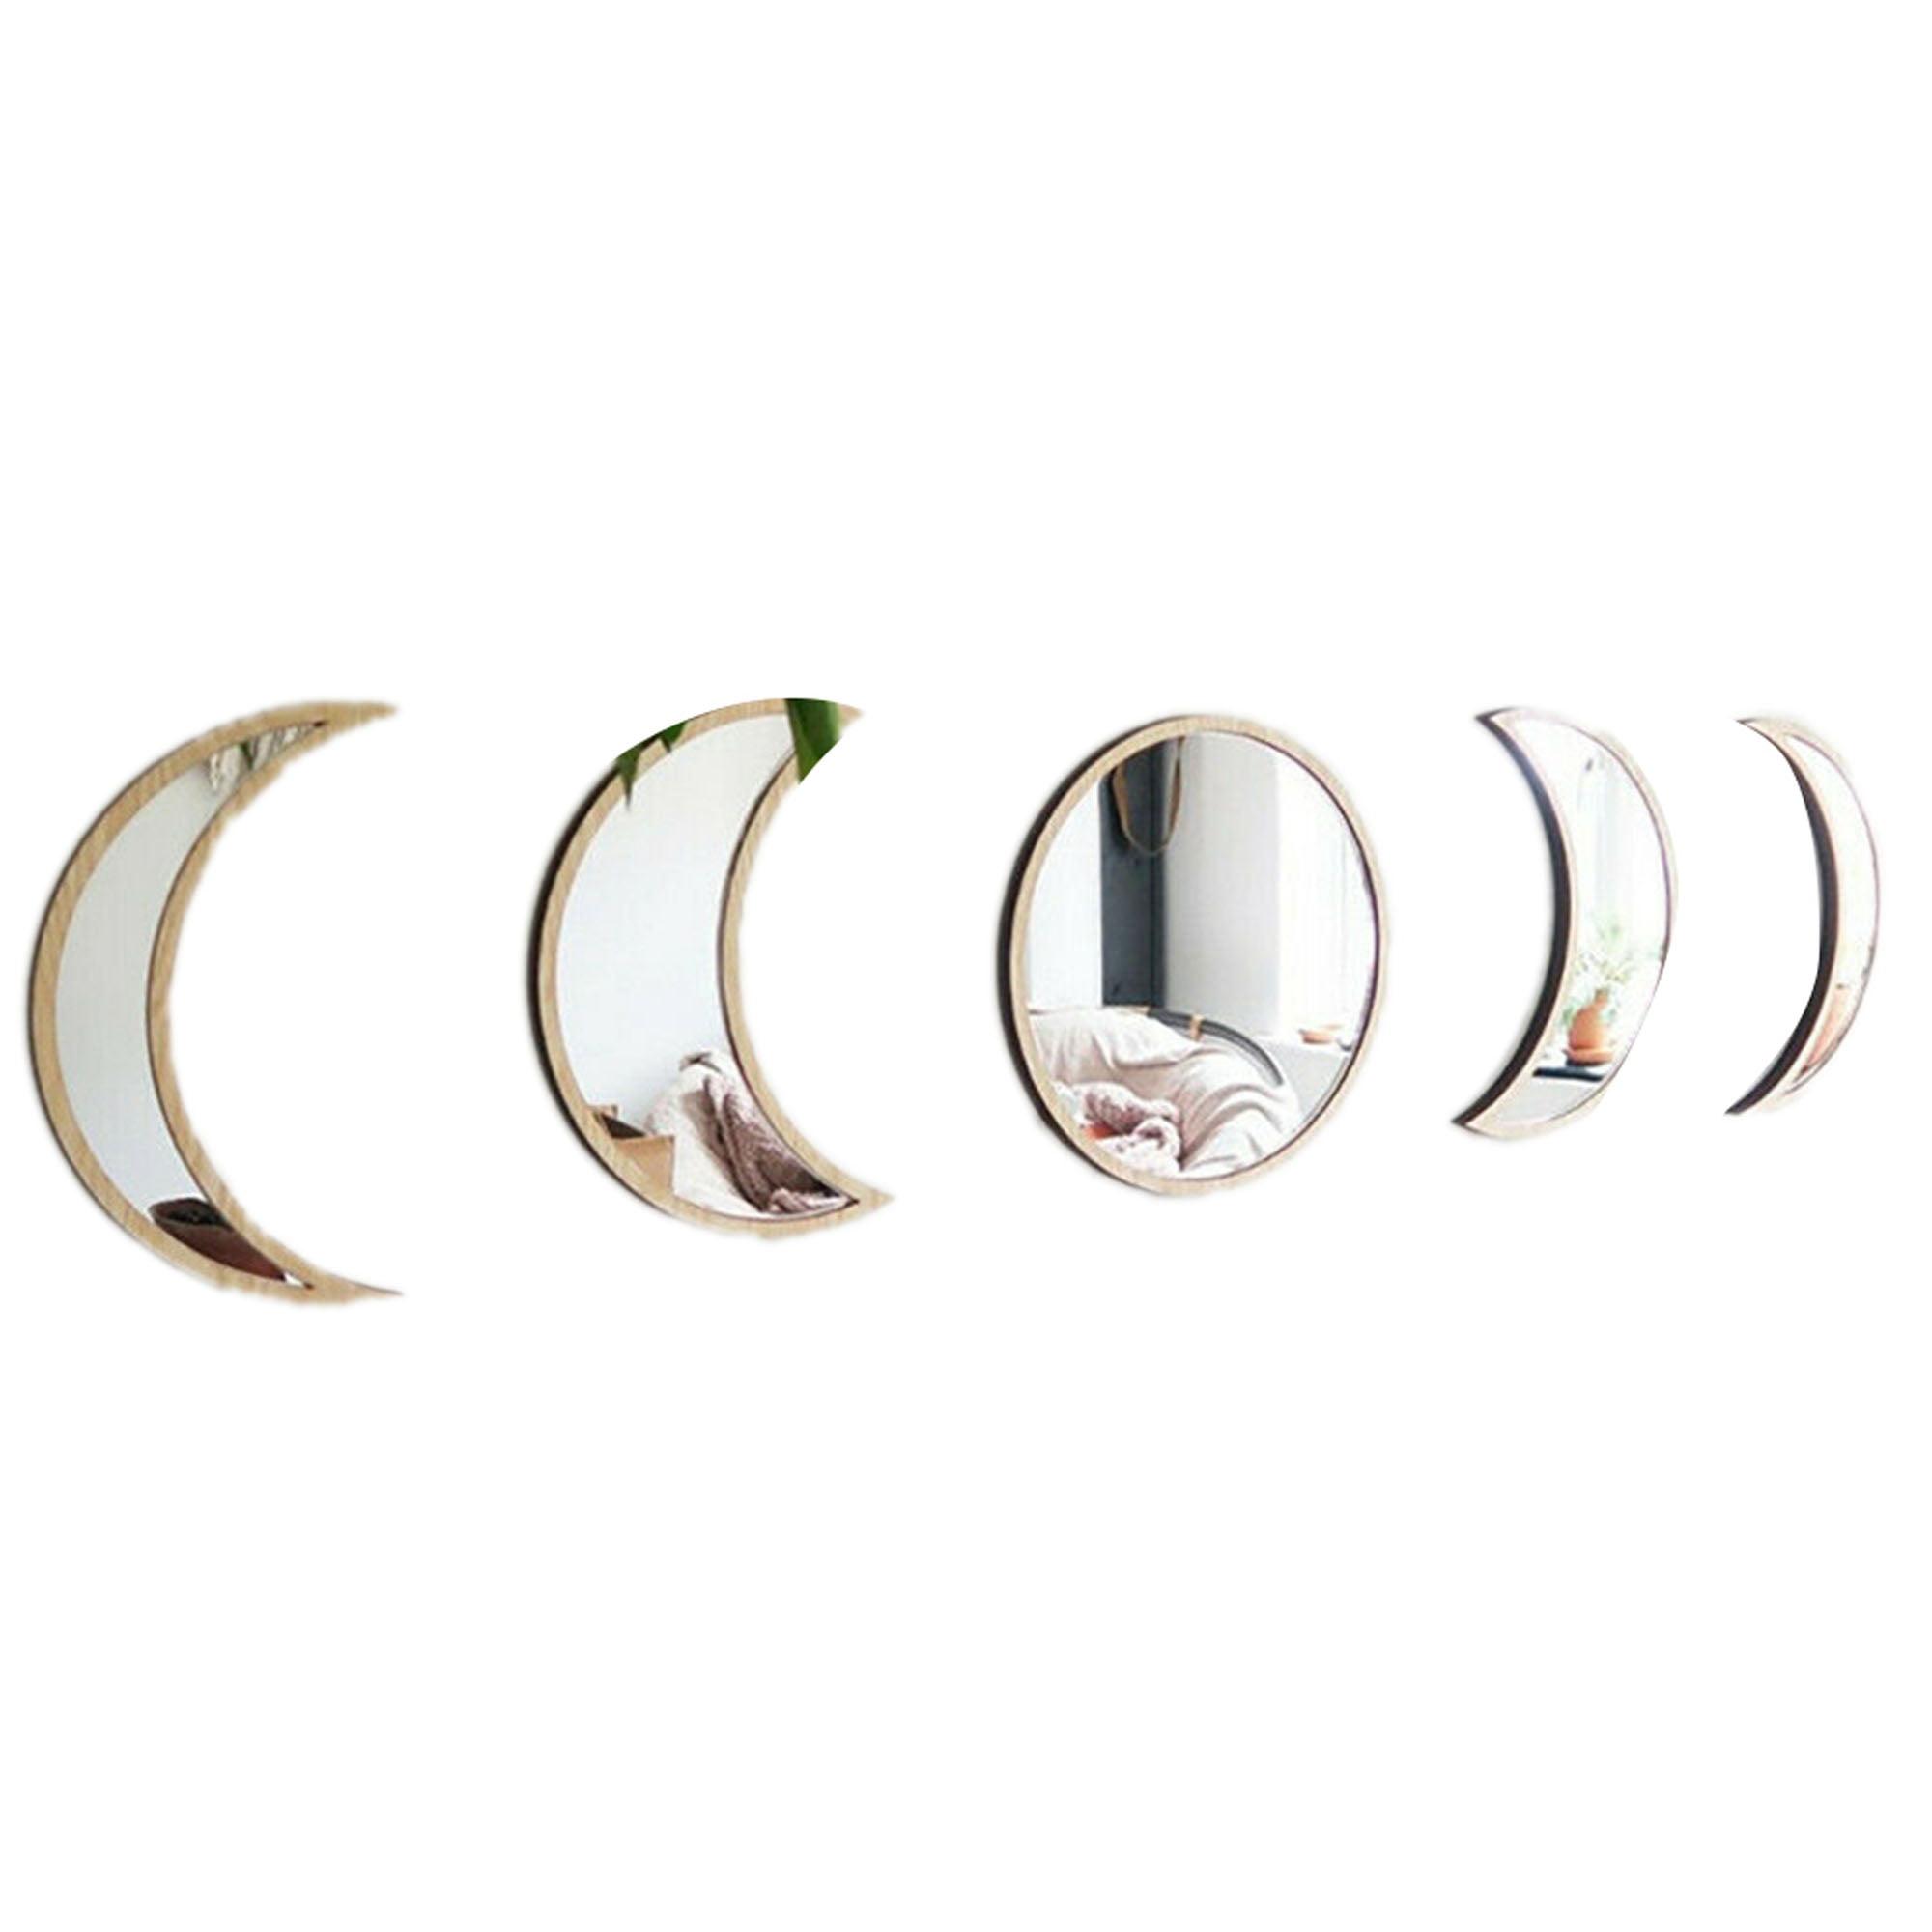 Sunisery Acrylic Decorative Mirrors Diy Wooden Moon Phase Mirror For Living Room Bedroom Decor Walmart Com Walmart Com